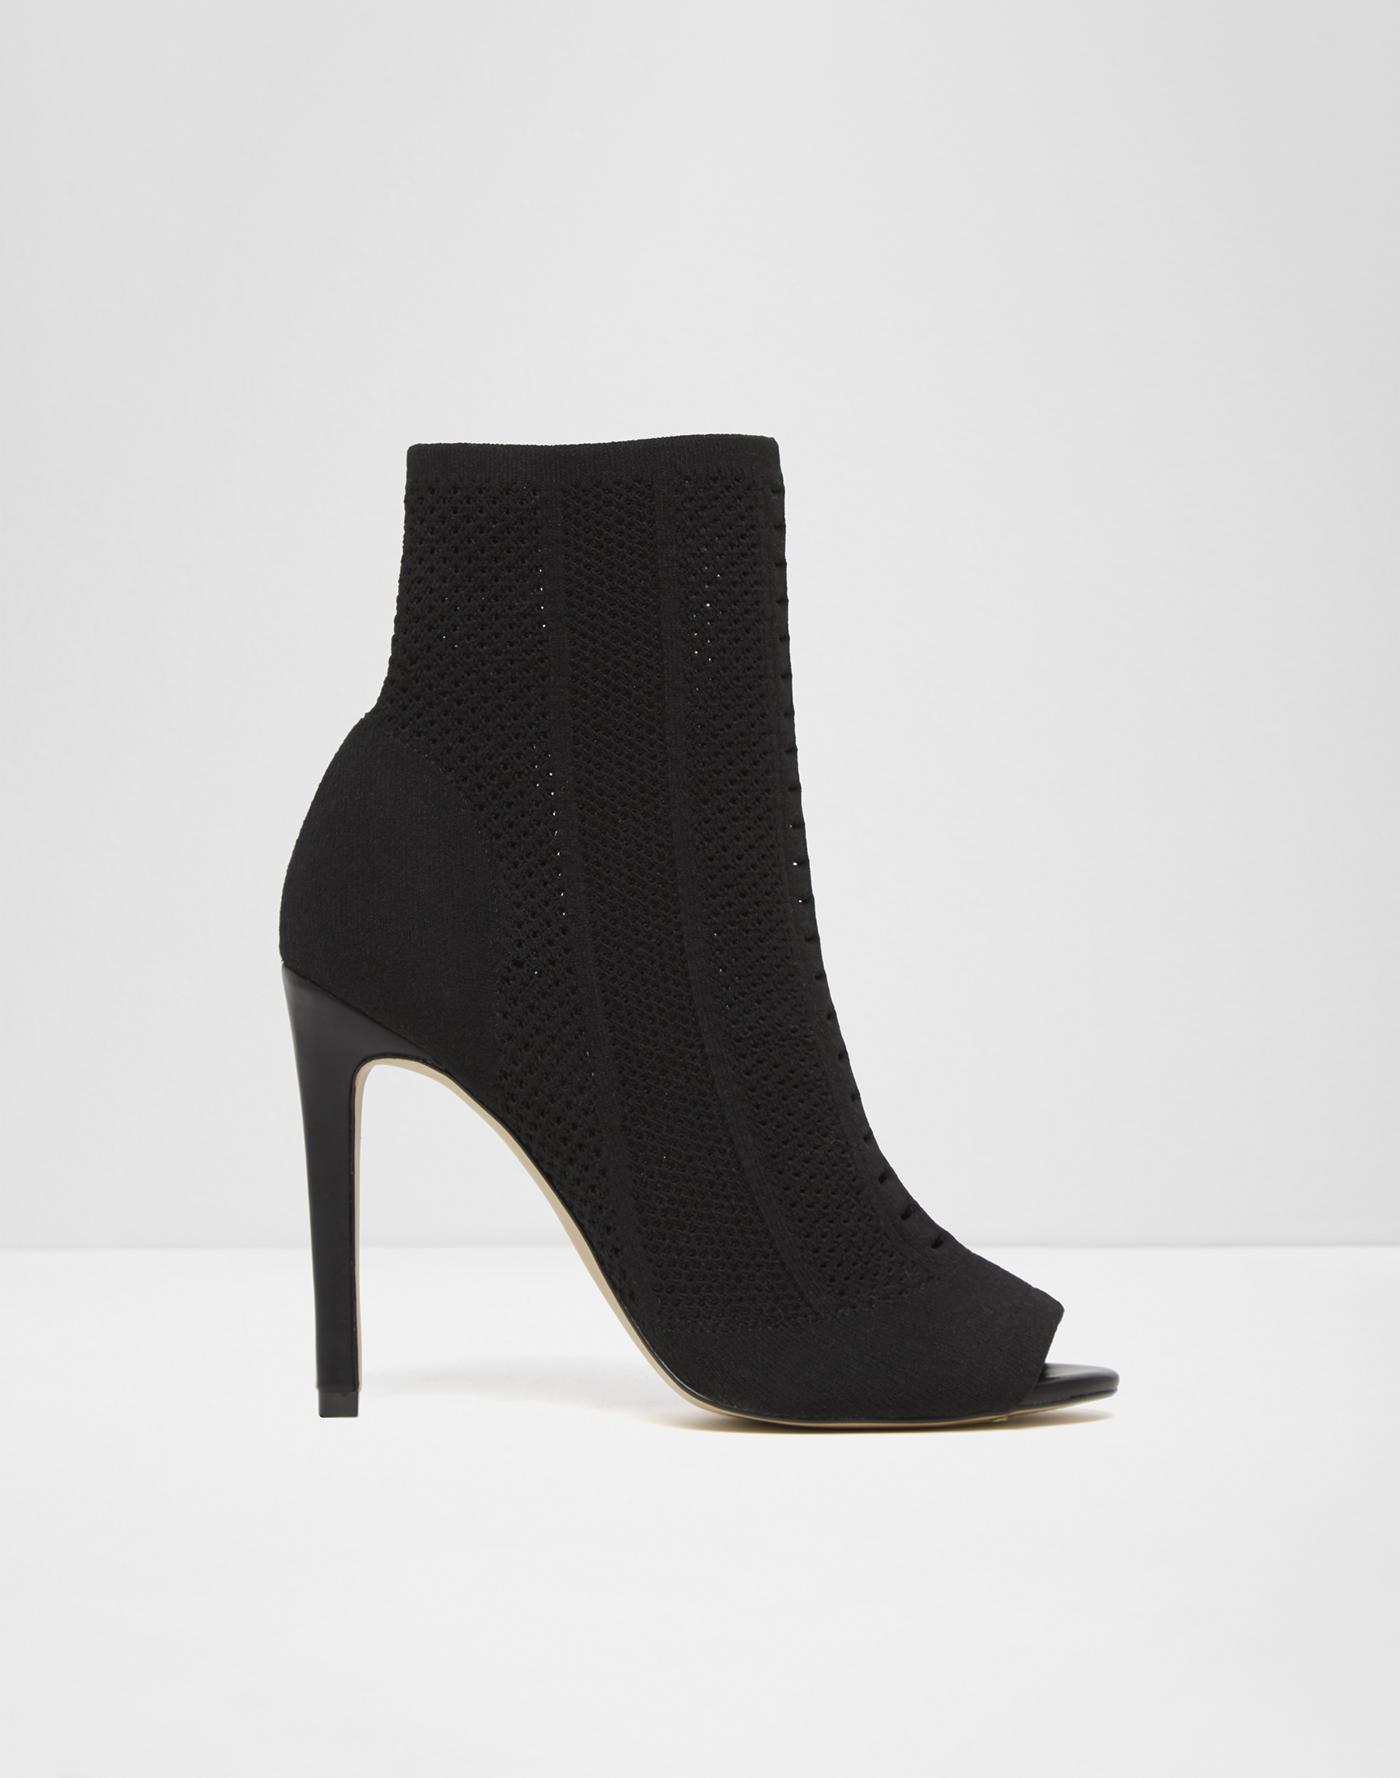 Womens Aldo Keira Boots Black Leather DYF59173